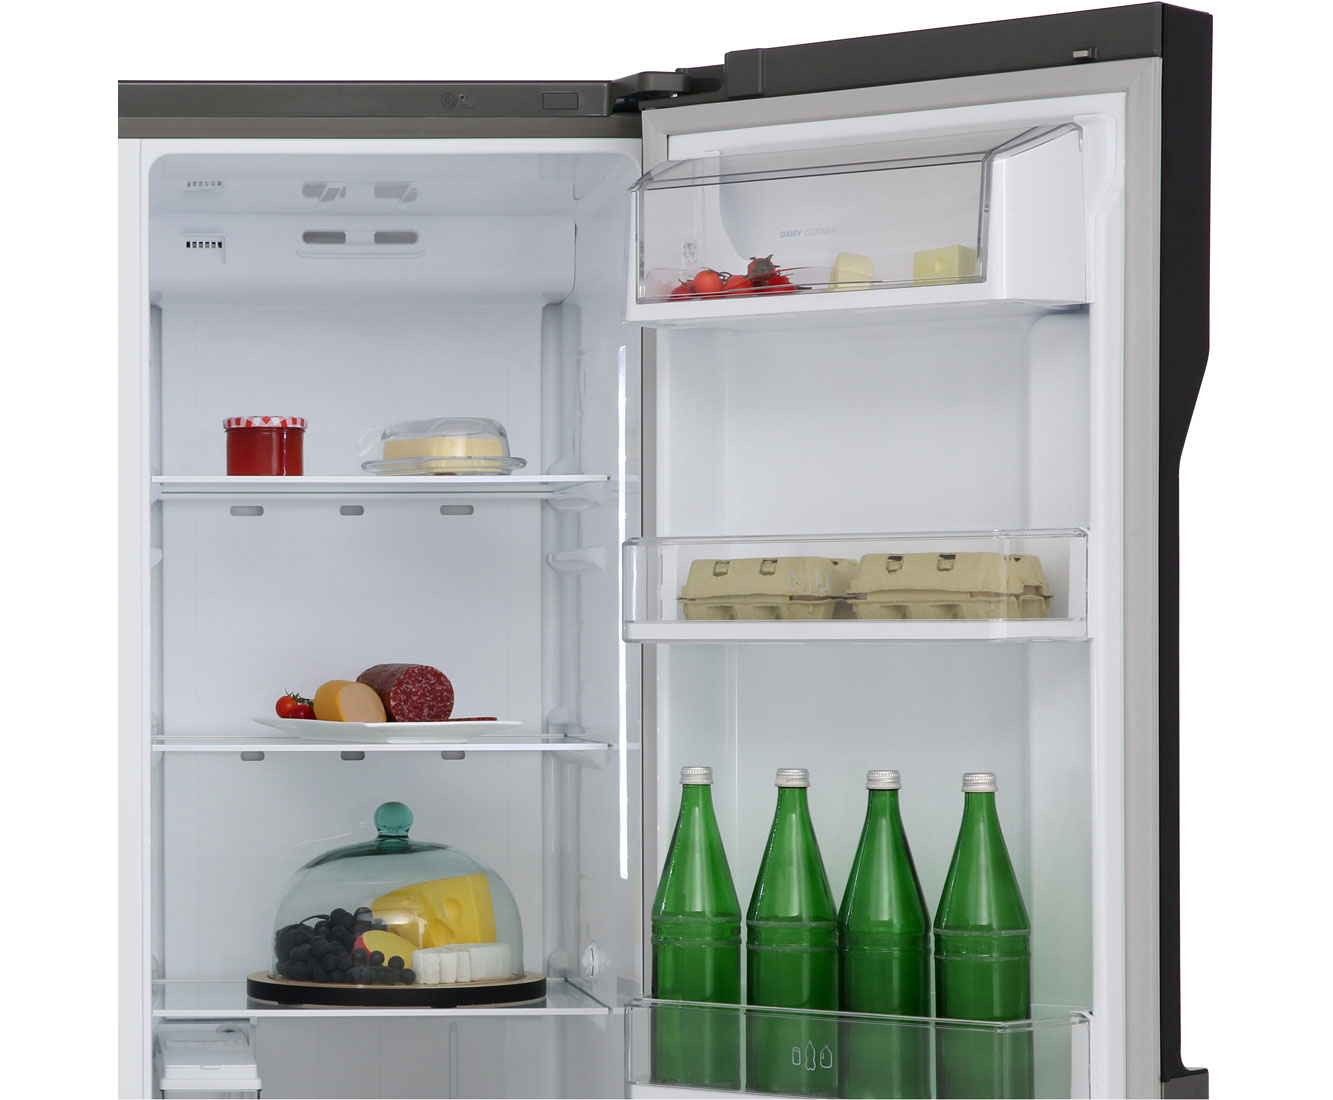 Side By Side Kühlschrank Türen Demontieren : Lg side by side kühlschrank türen demontieren: waschmaschine lg f wm